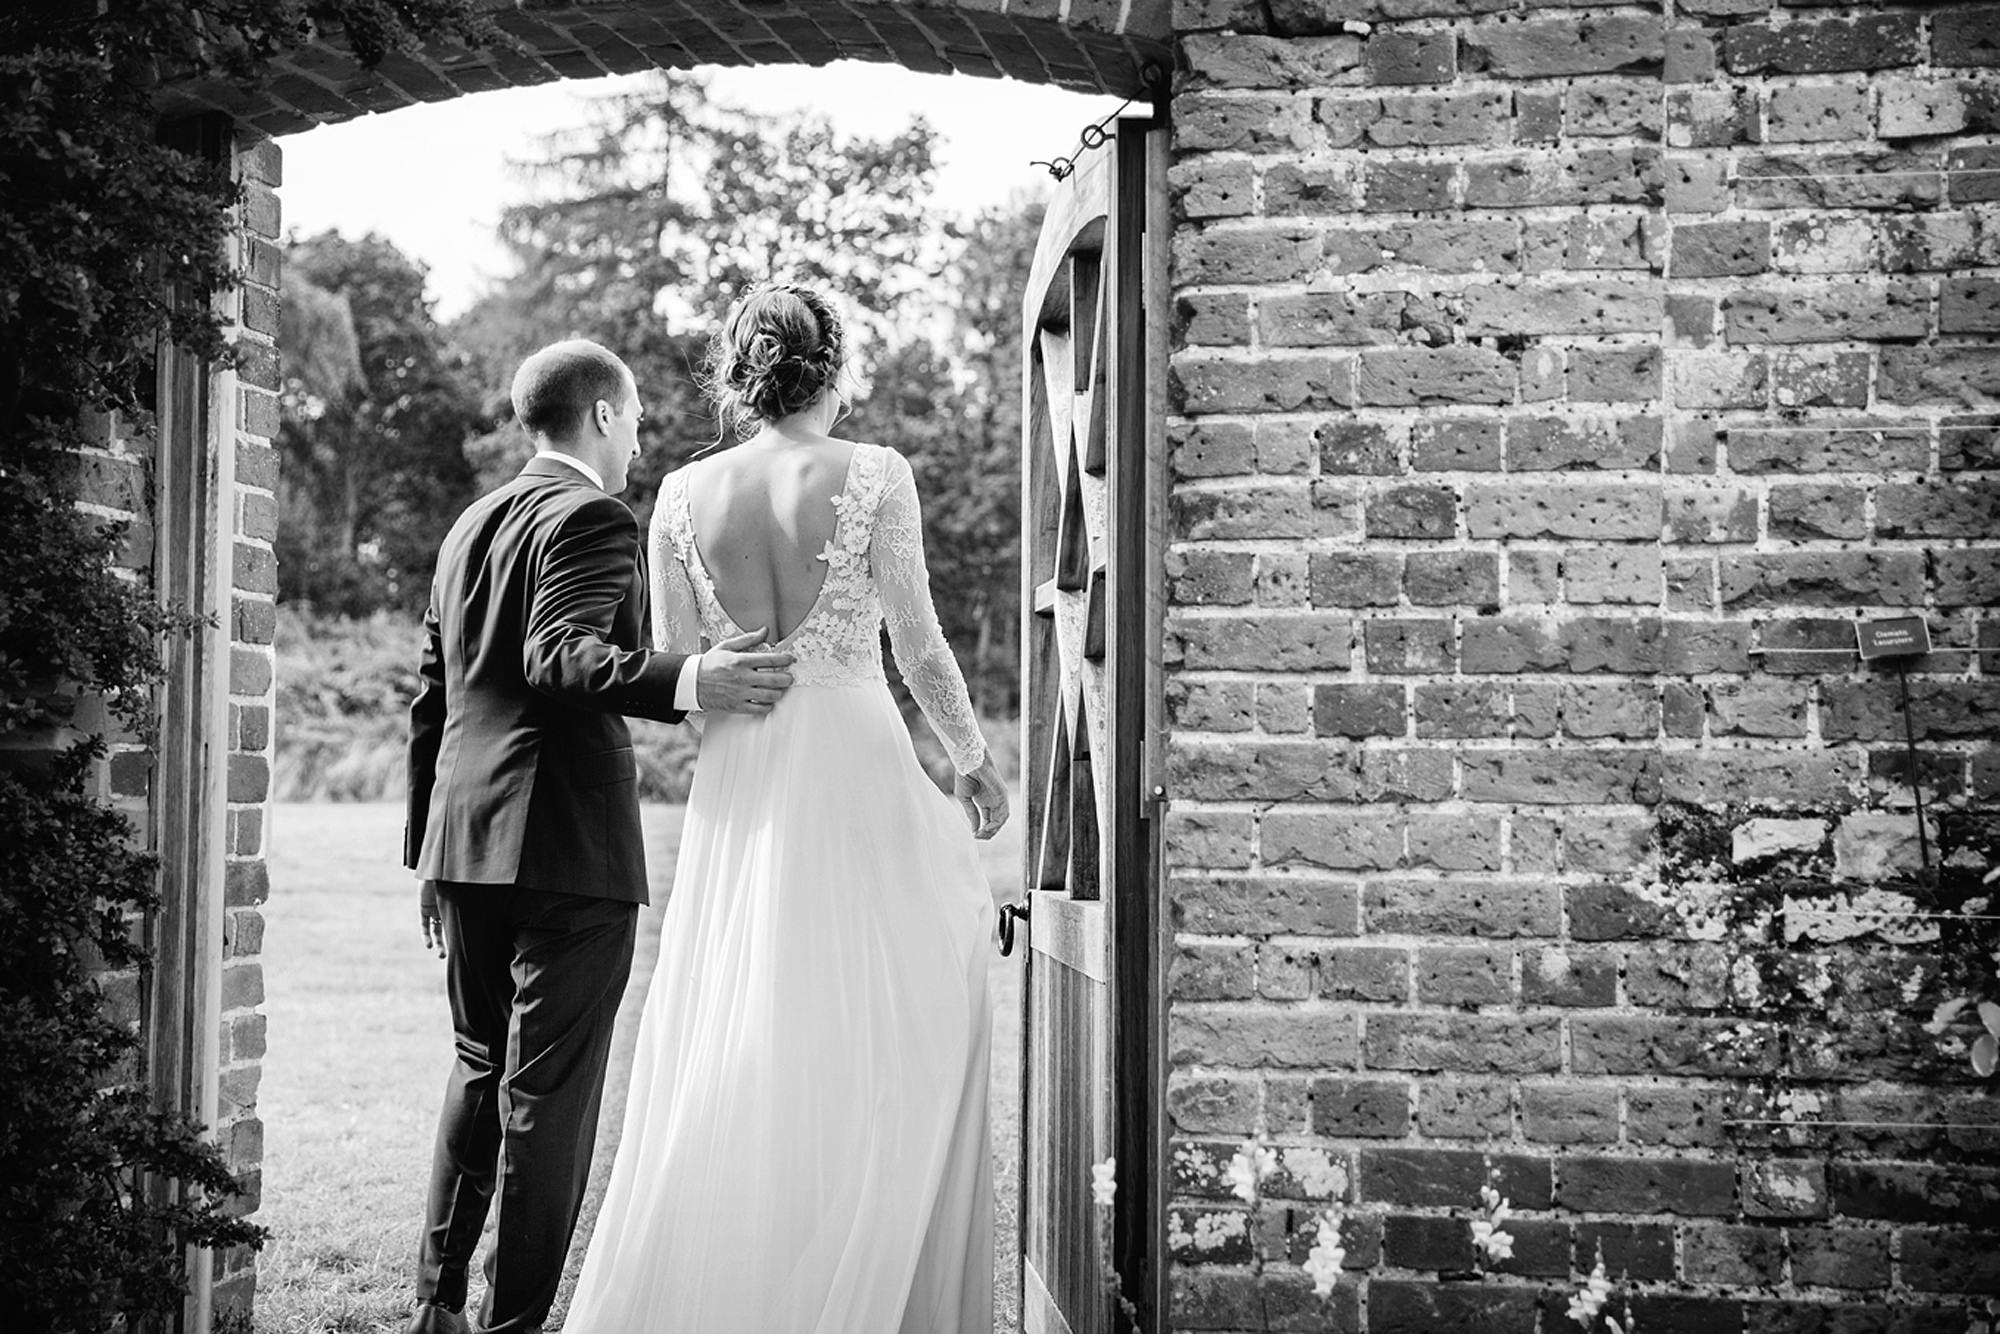 Marks Hall Estate wedding photography bride and groom going through garden door